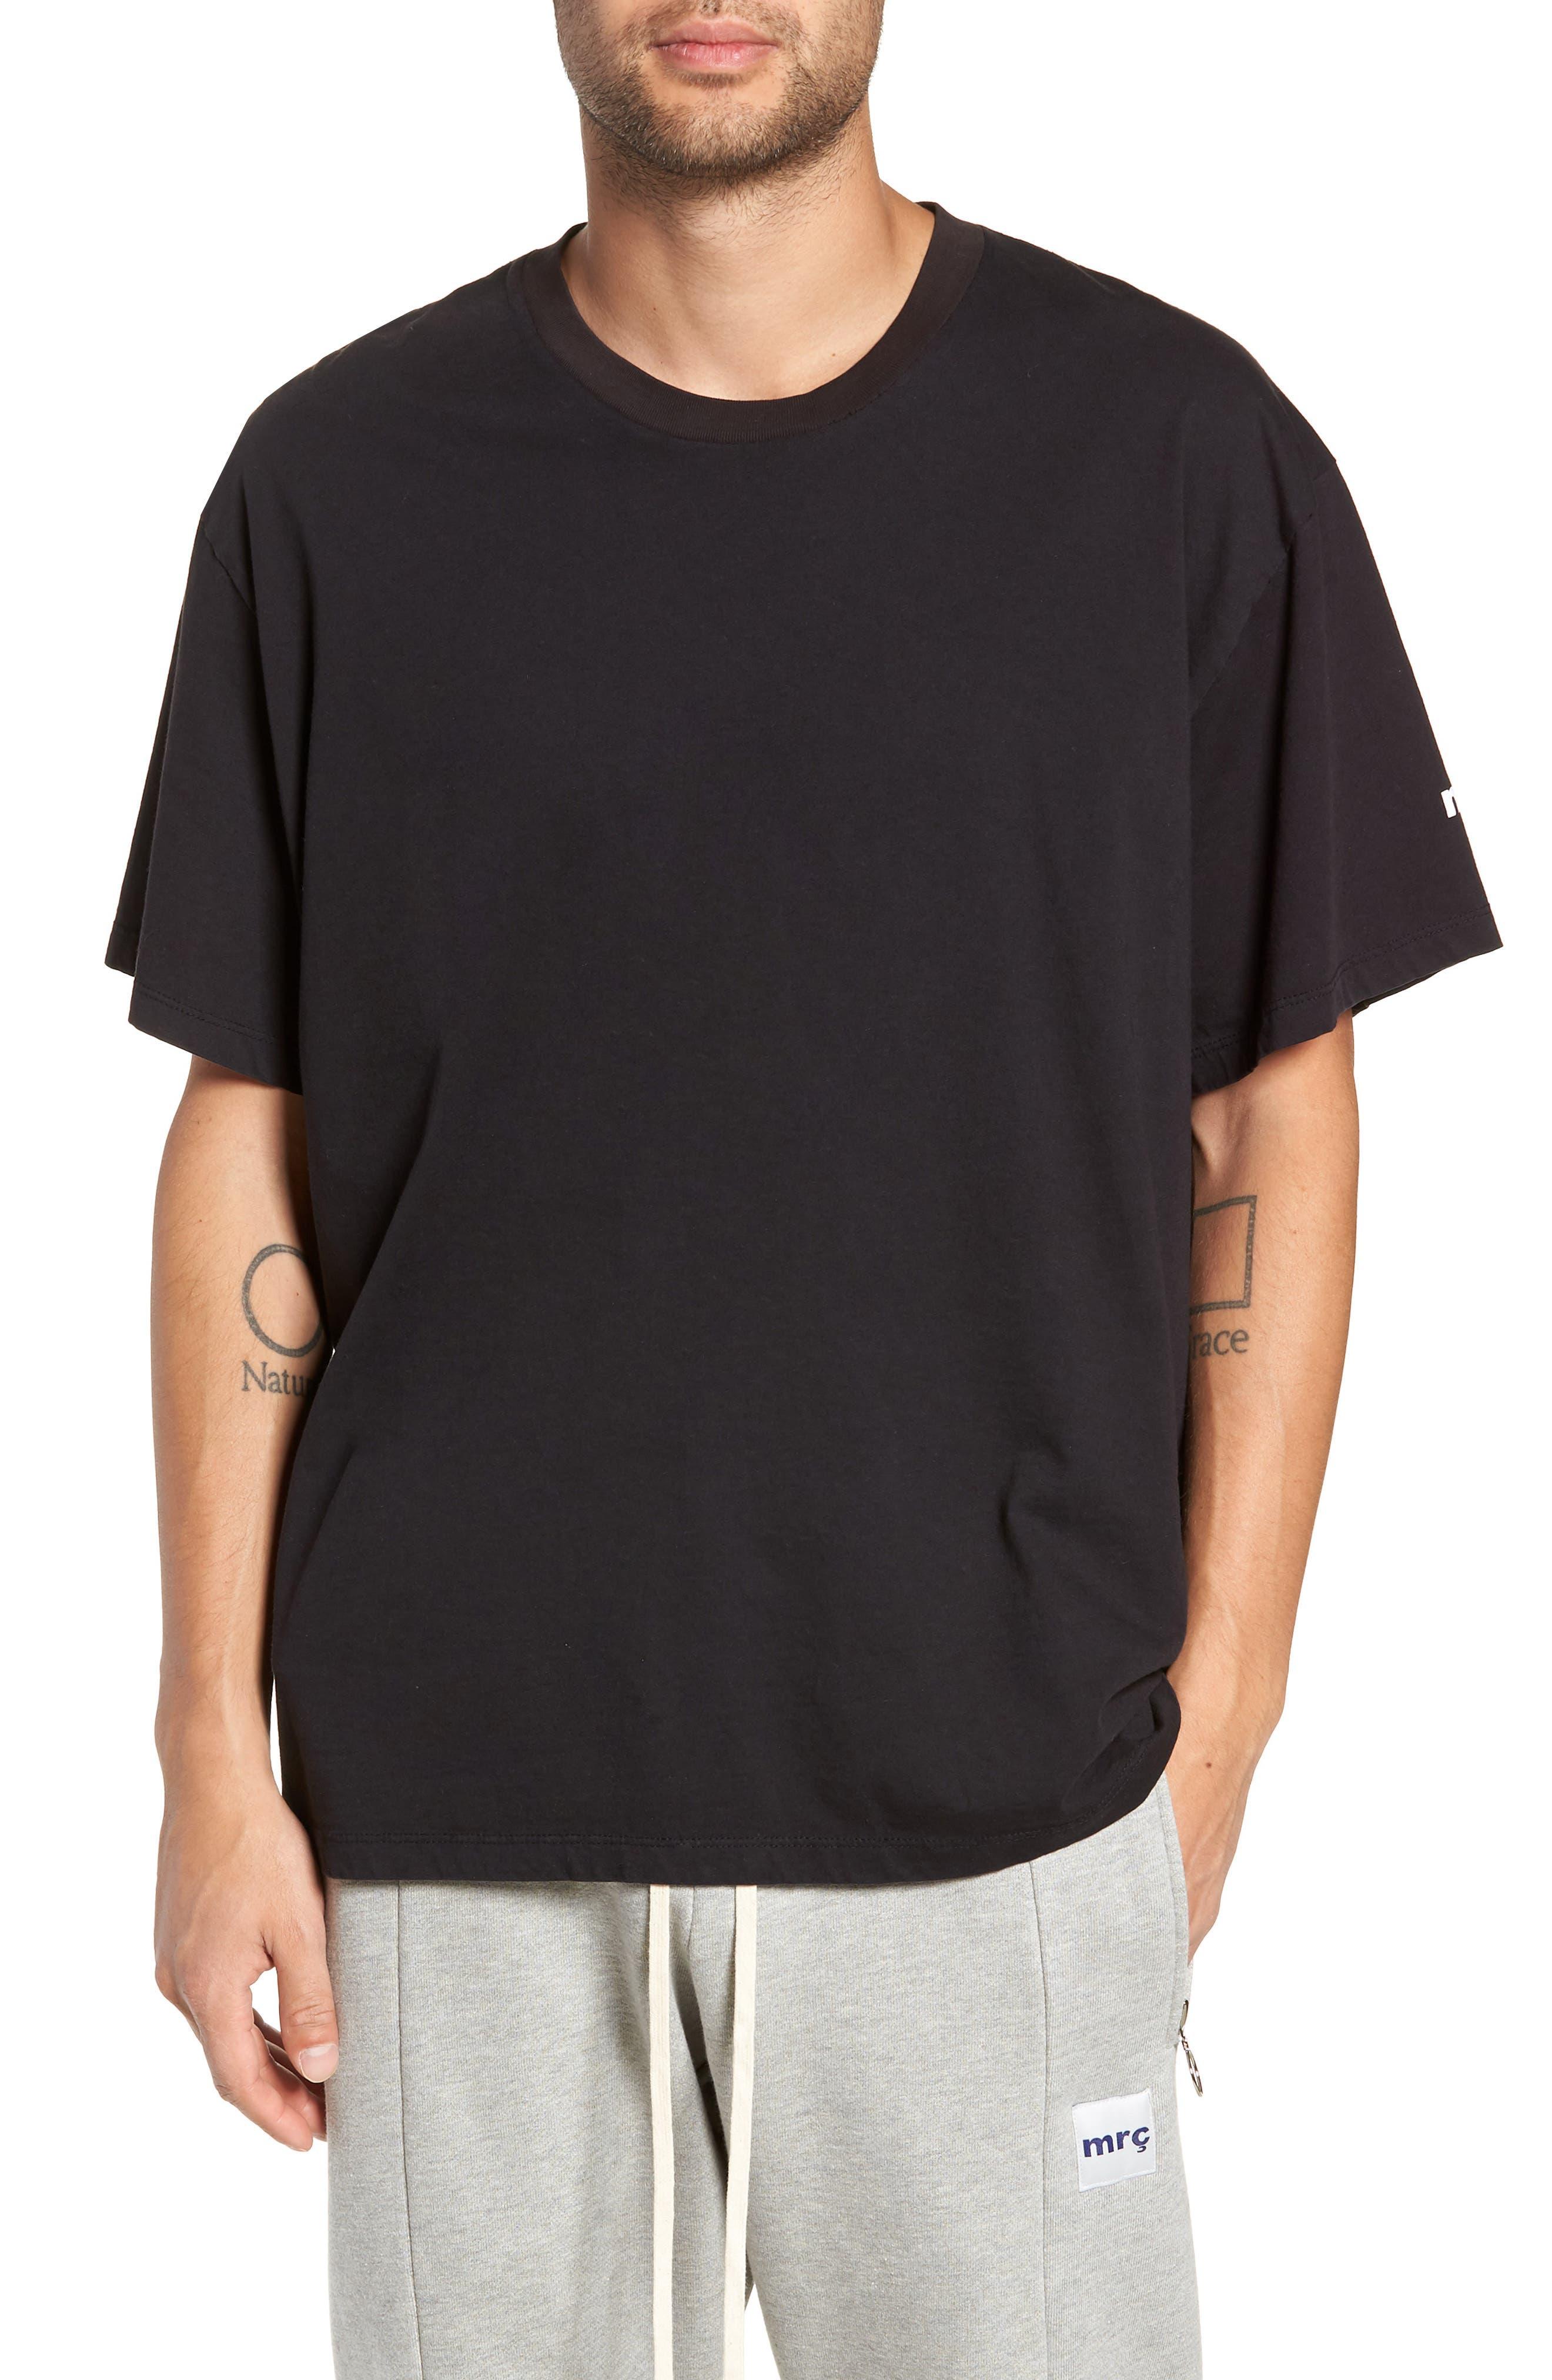 Same Old Madness Oversize T-Shirt,                             Main thumbnail 1, color,                             BLACK